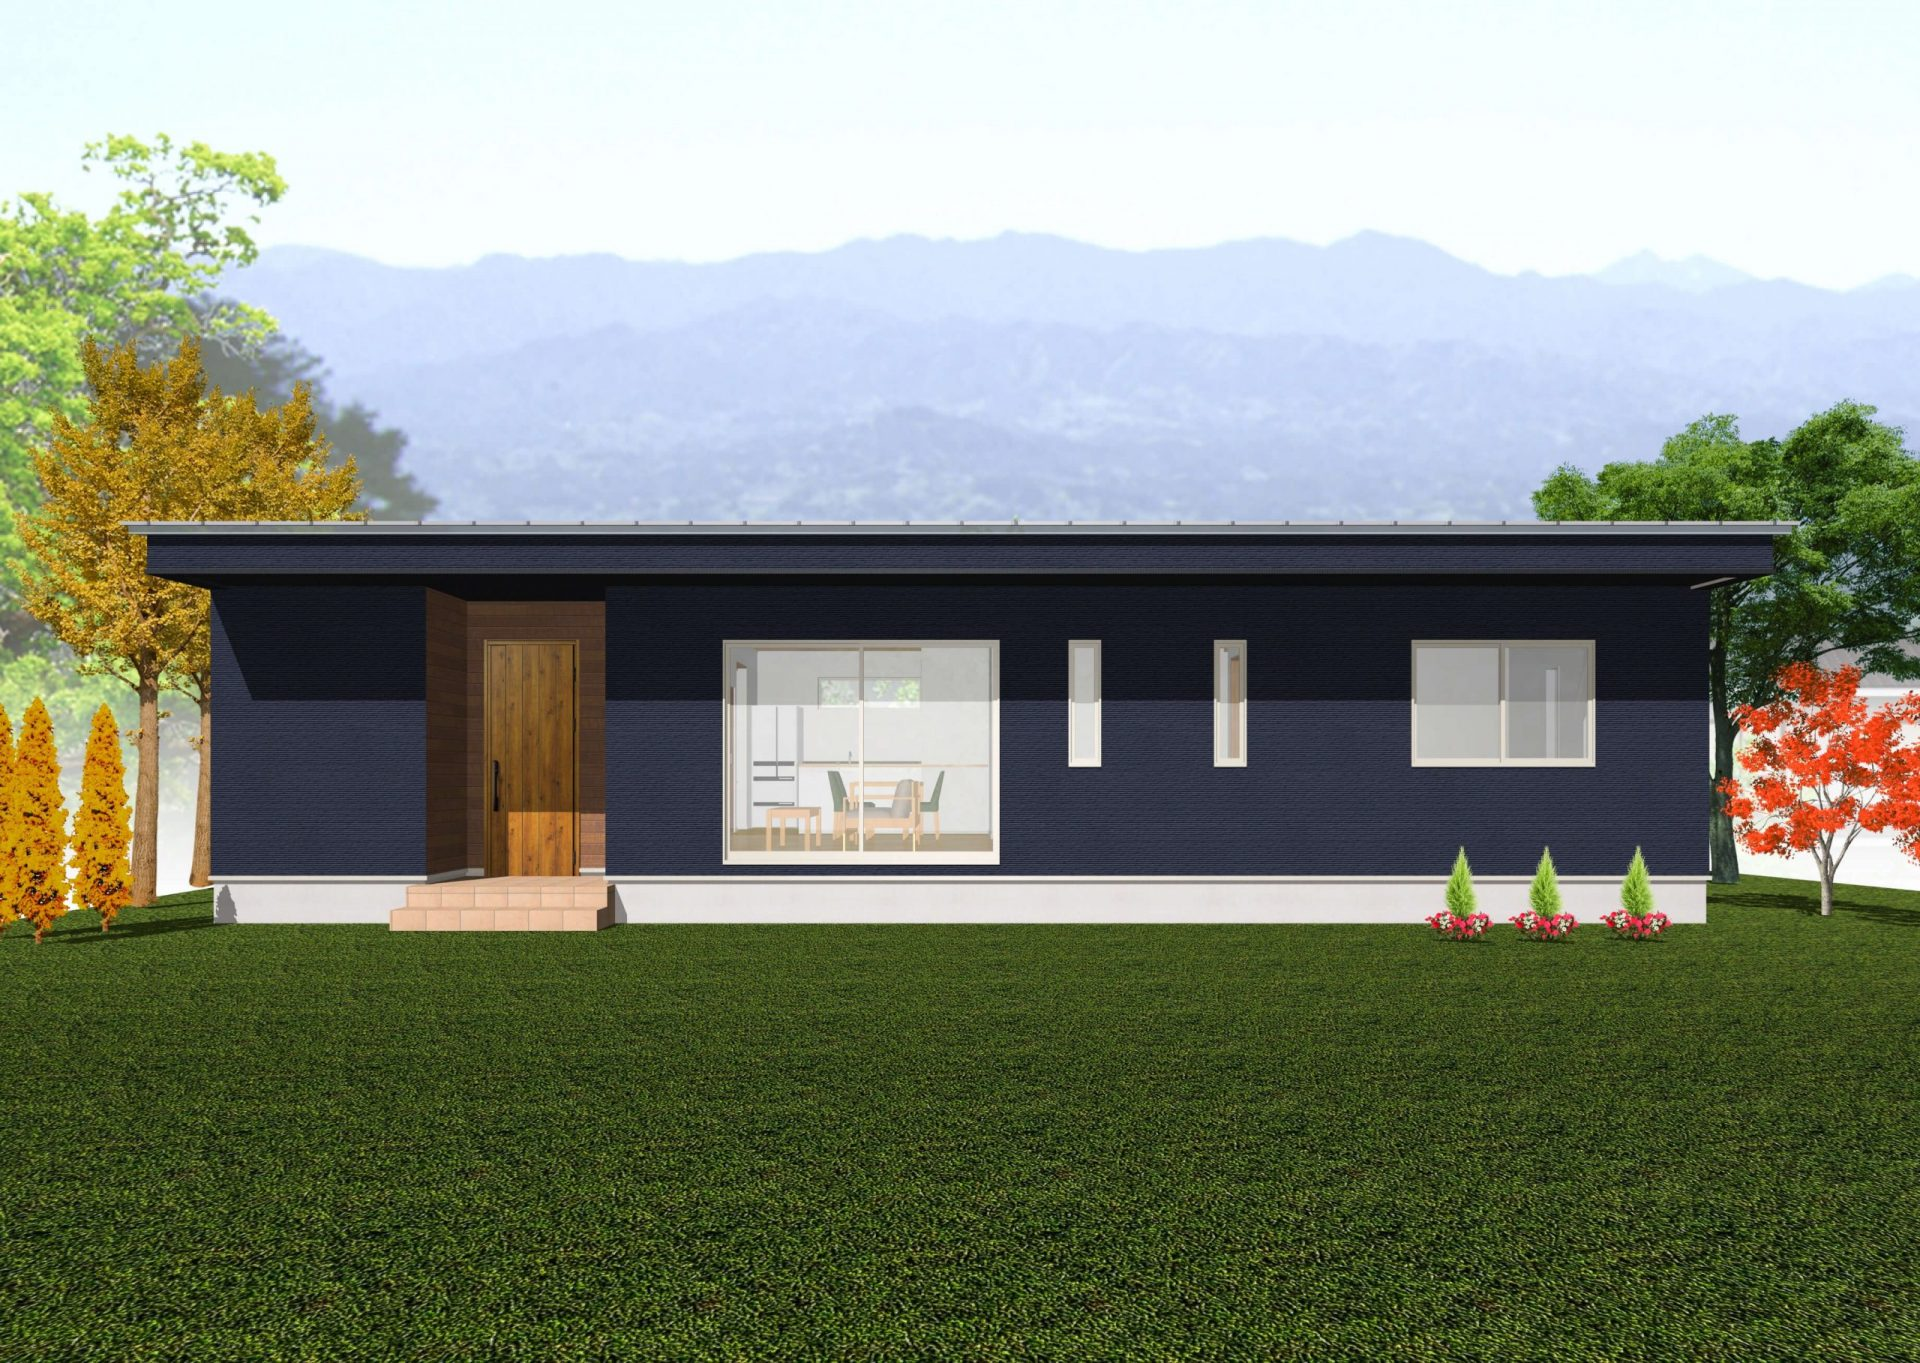 鉾田市で平屋の完成見学会20211016